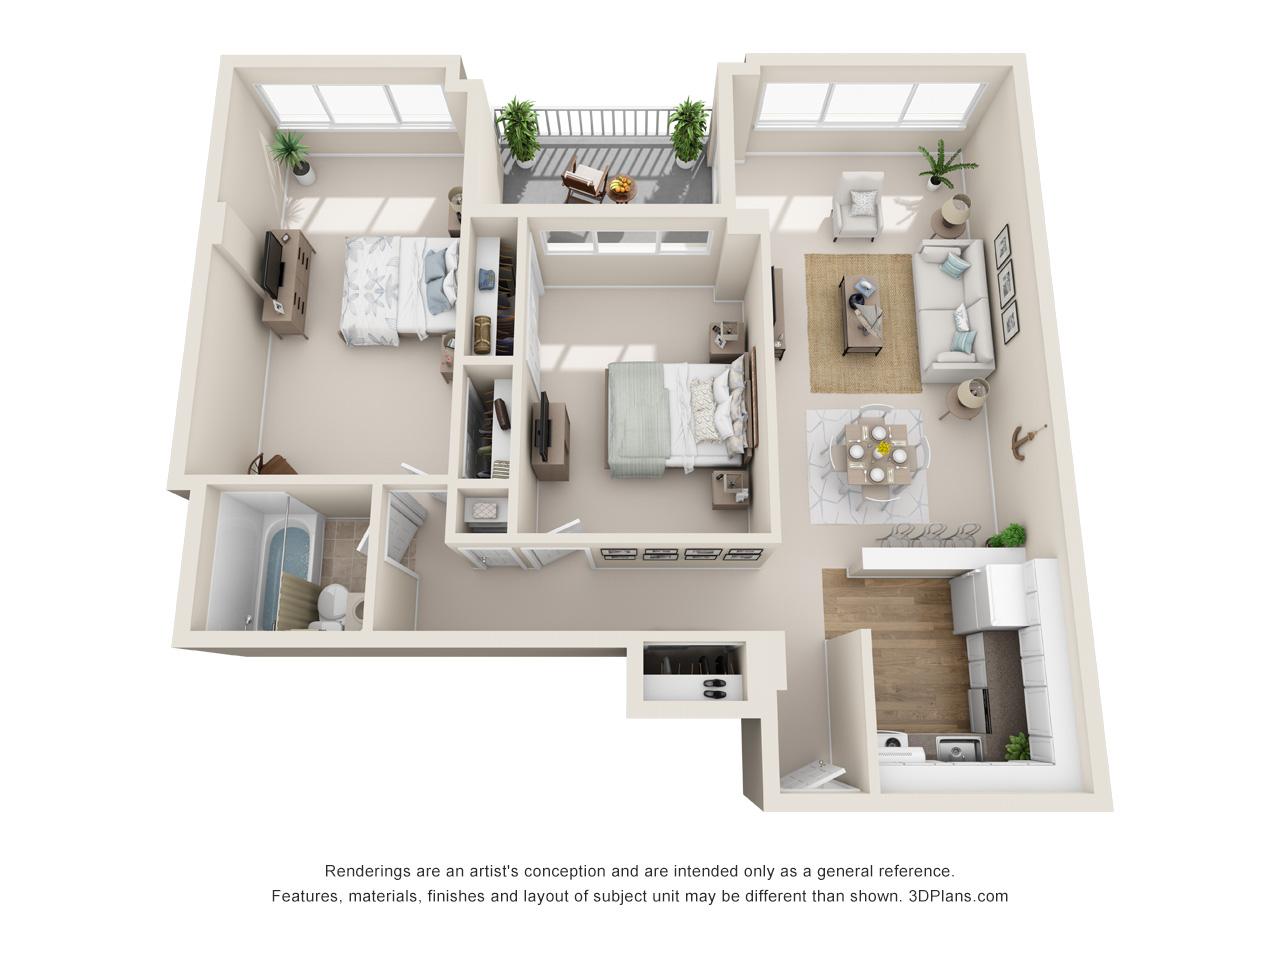 2 bedroom apartments in norristown